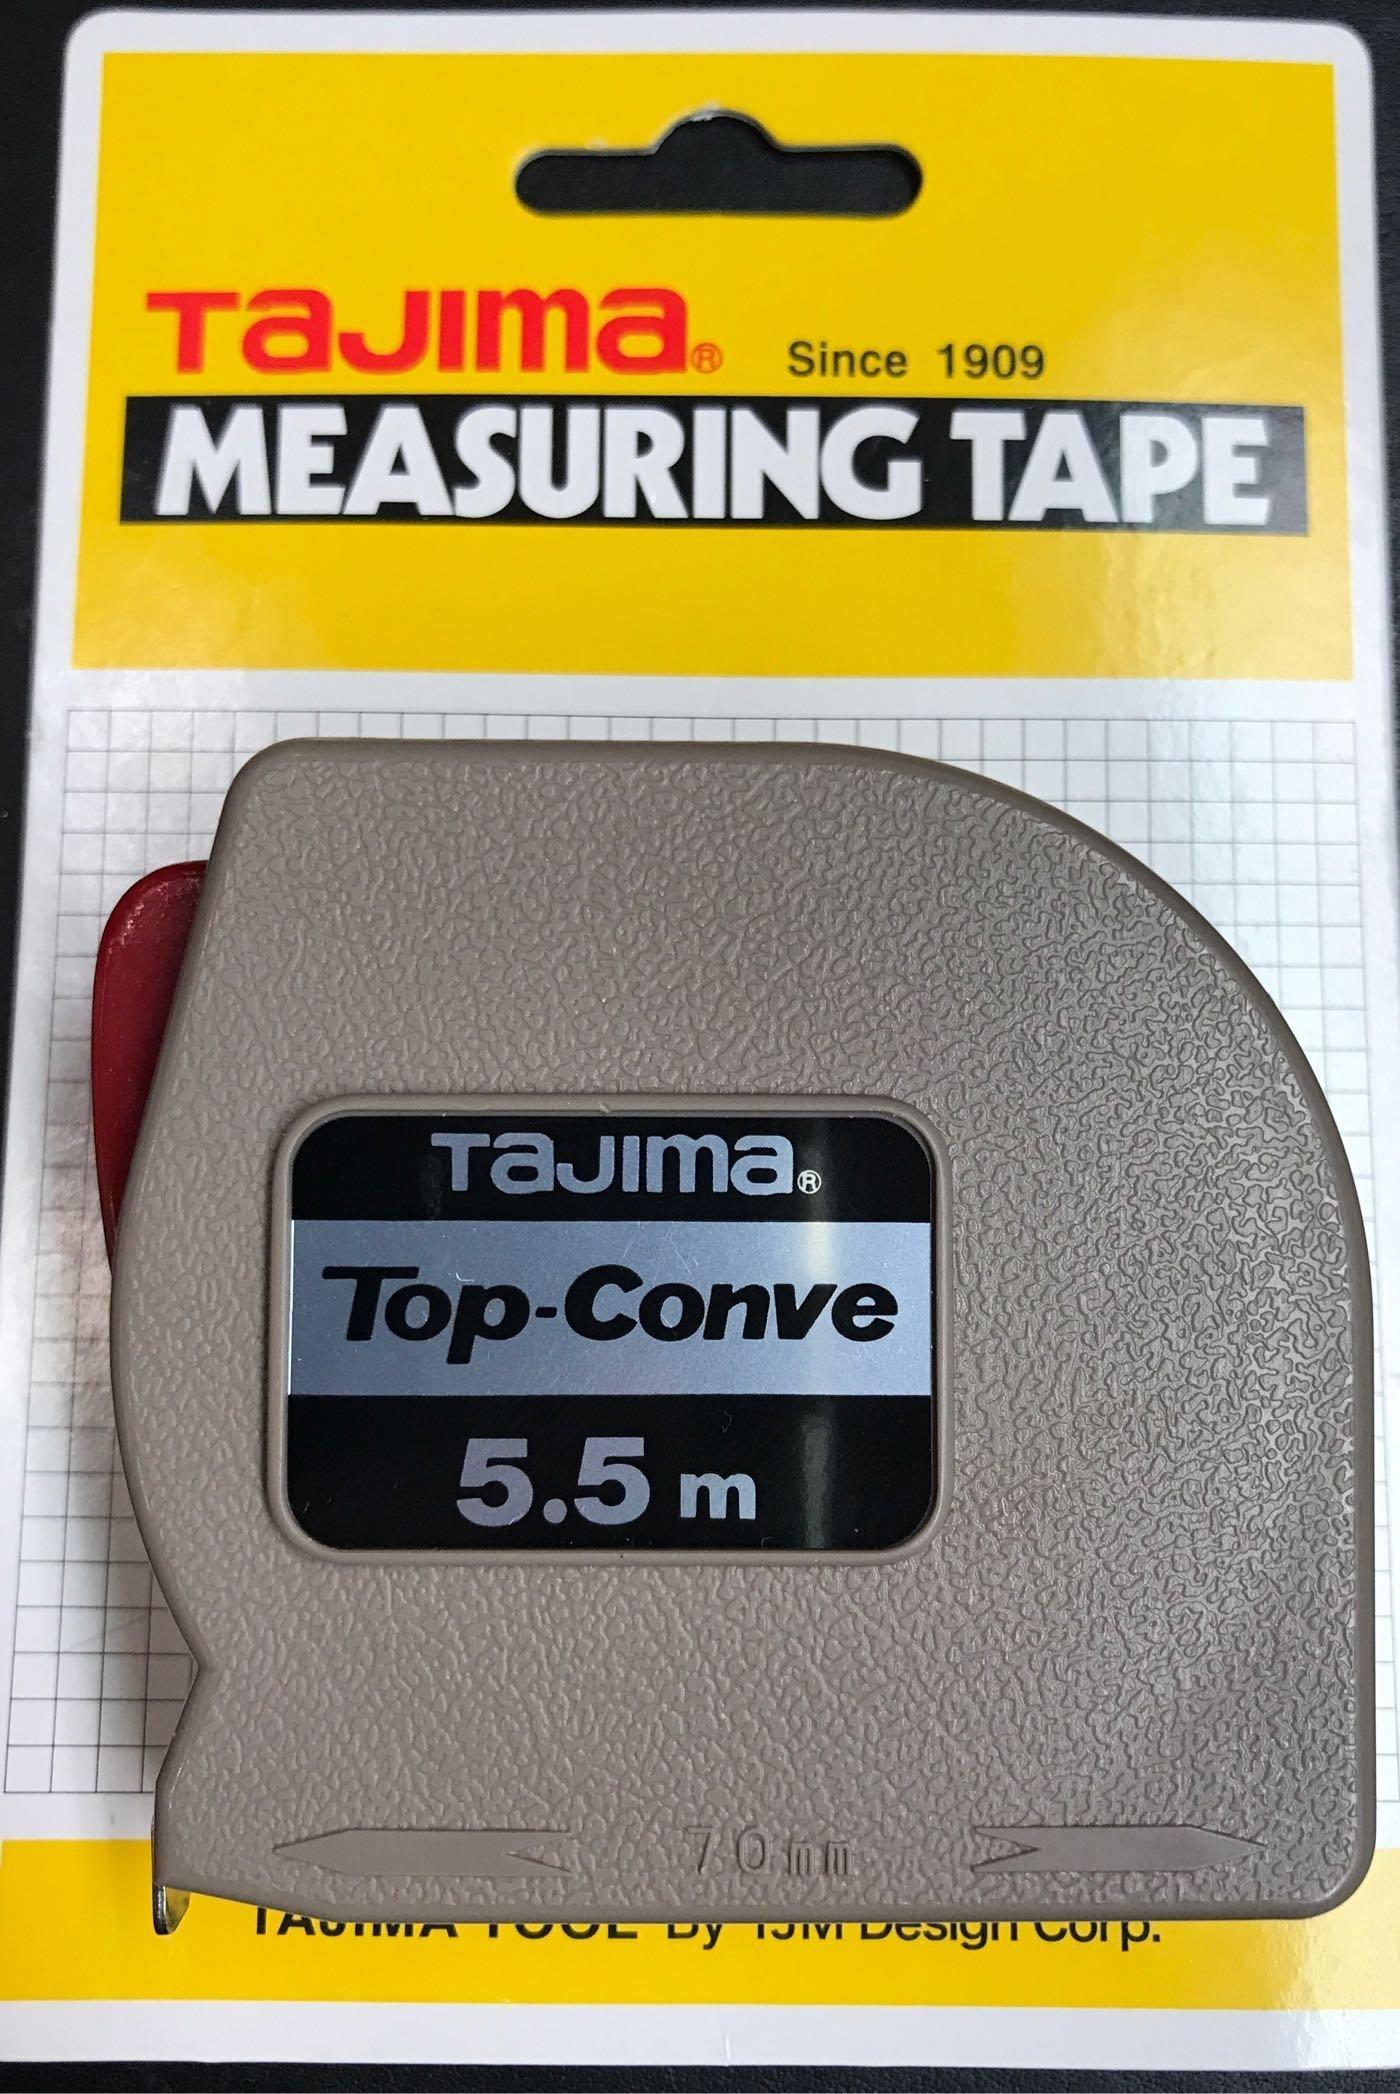 TAJIMA田島 Top-Conve 鋼捲尺 皮尺 捲尺長度5.5M  ---全家店到店取貨,可自行修改合併運費